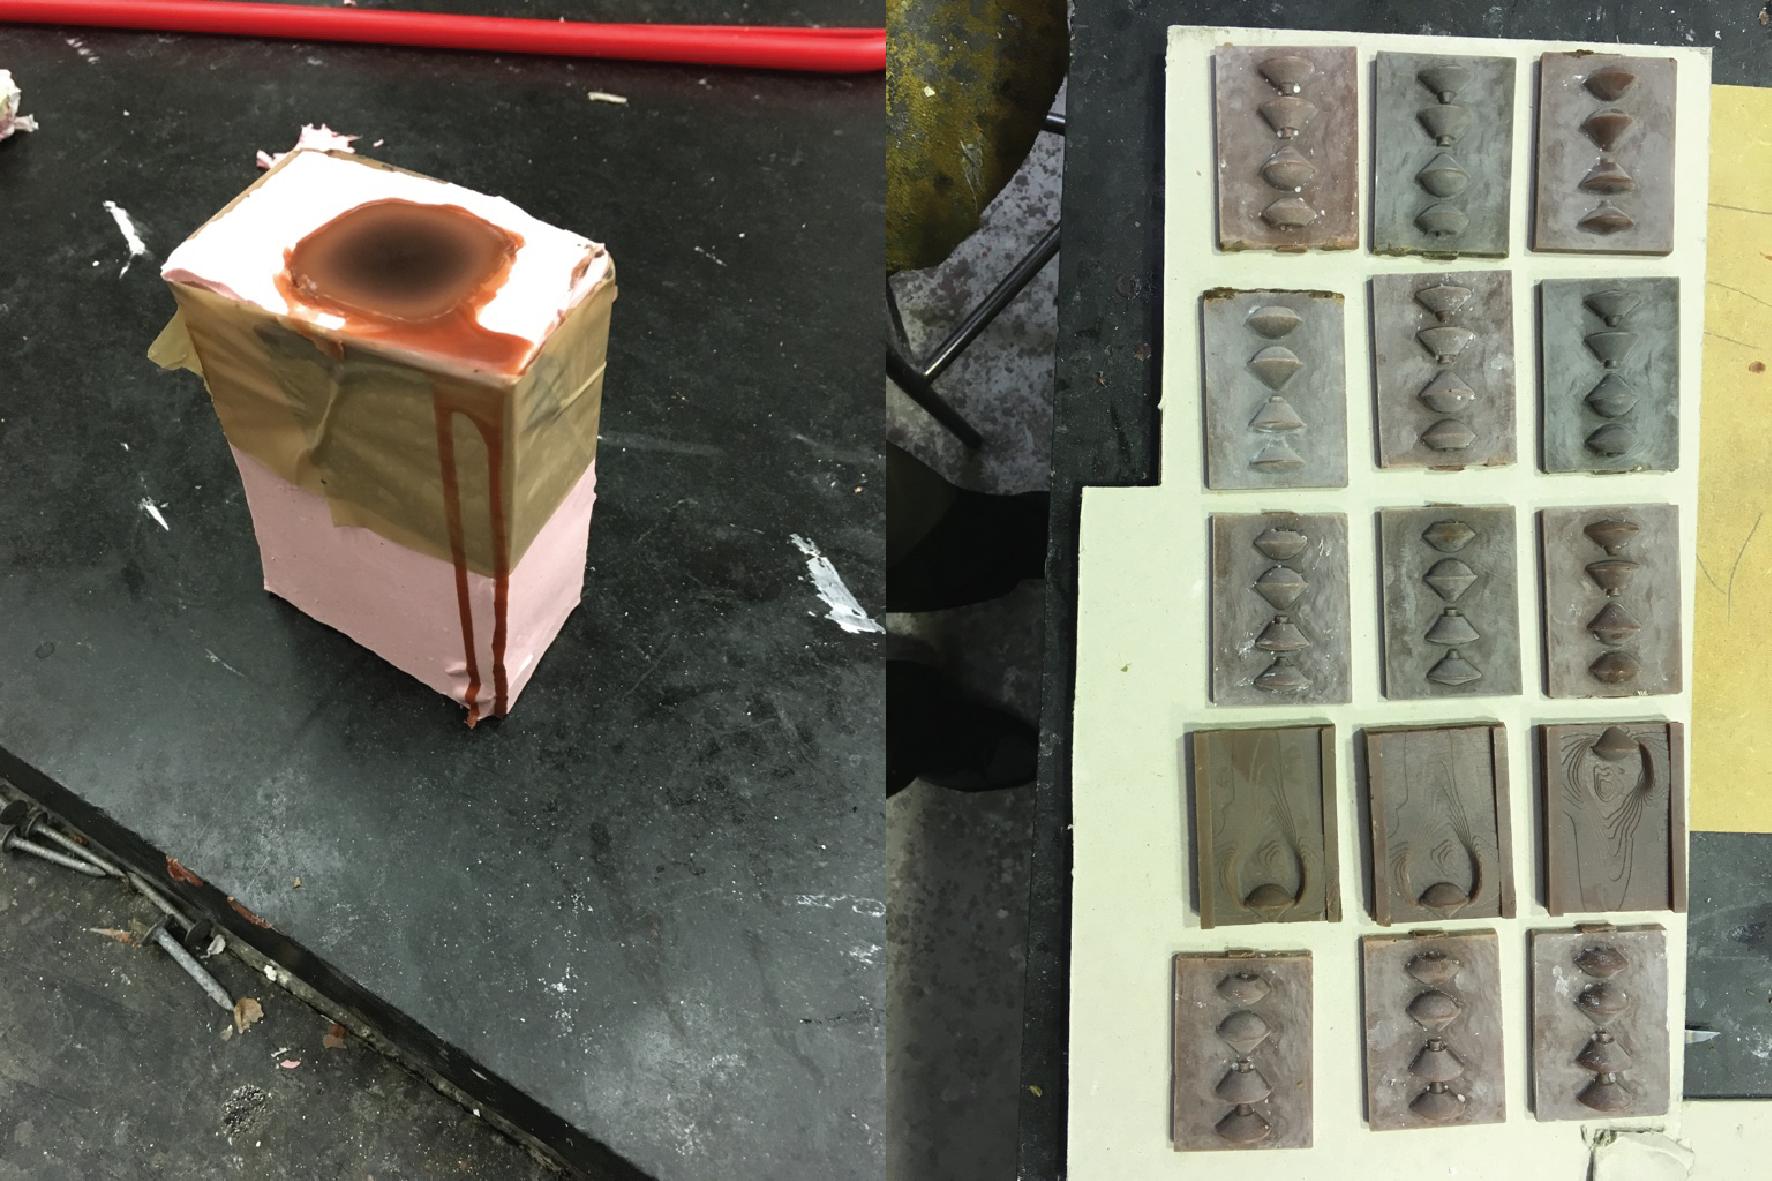 creating wax models